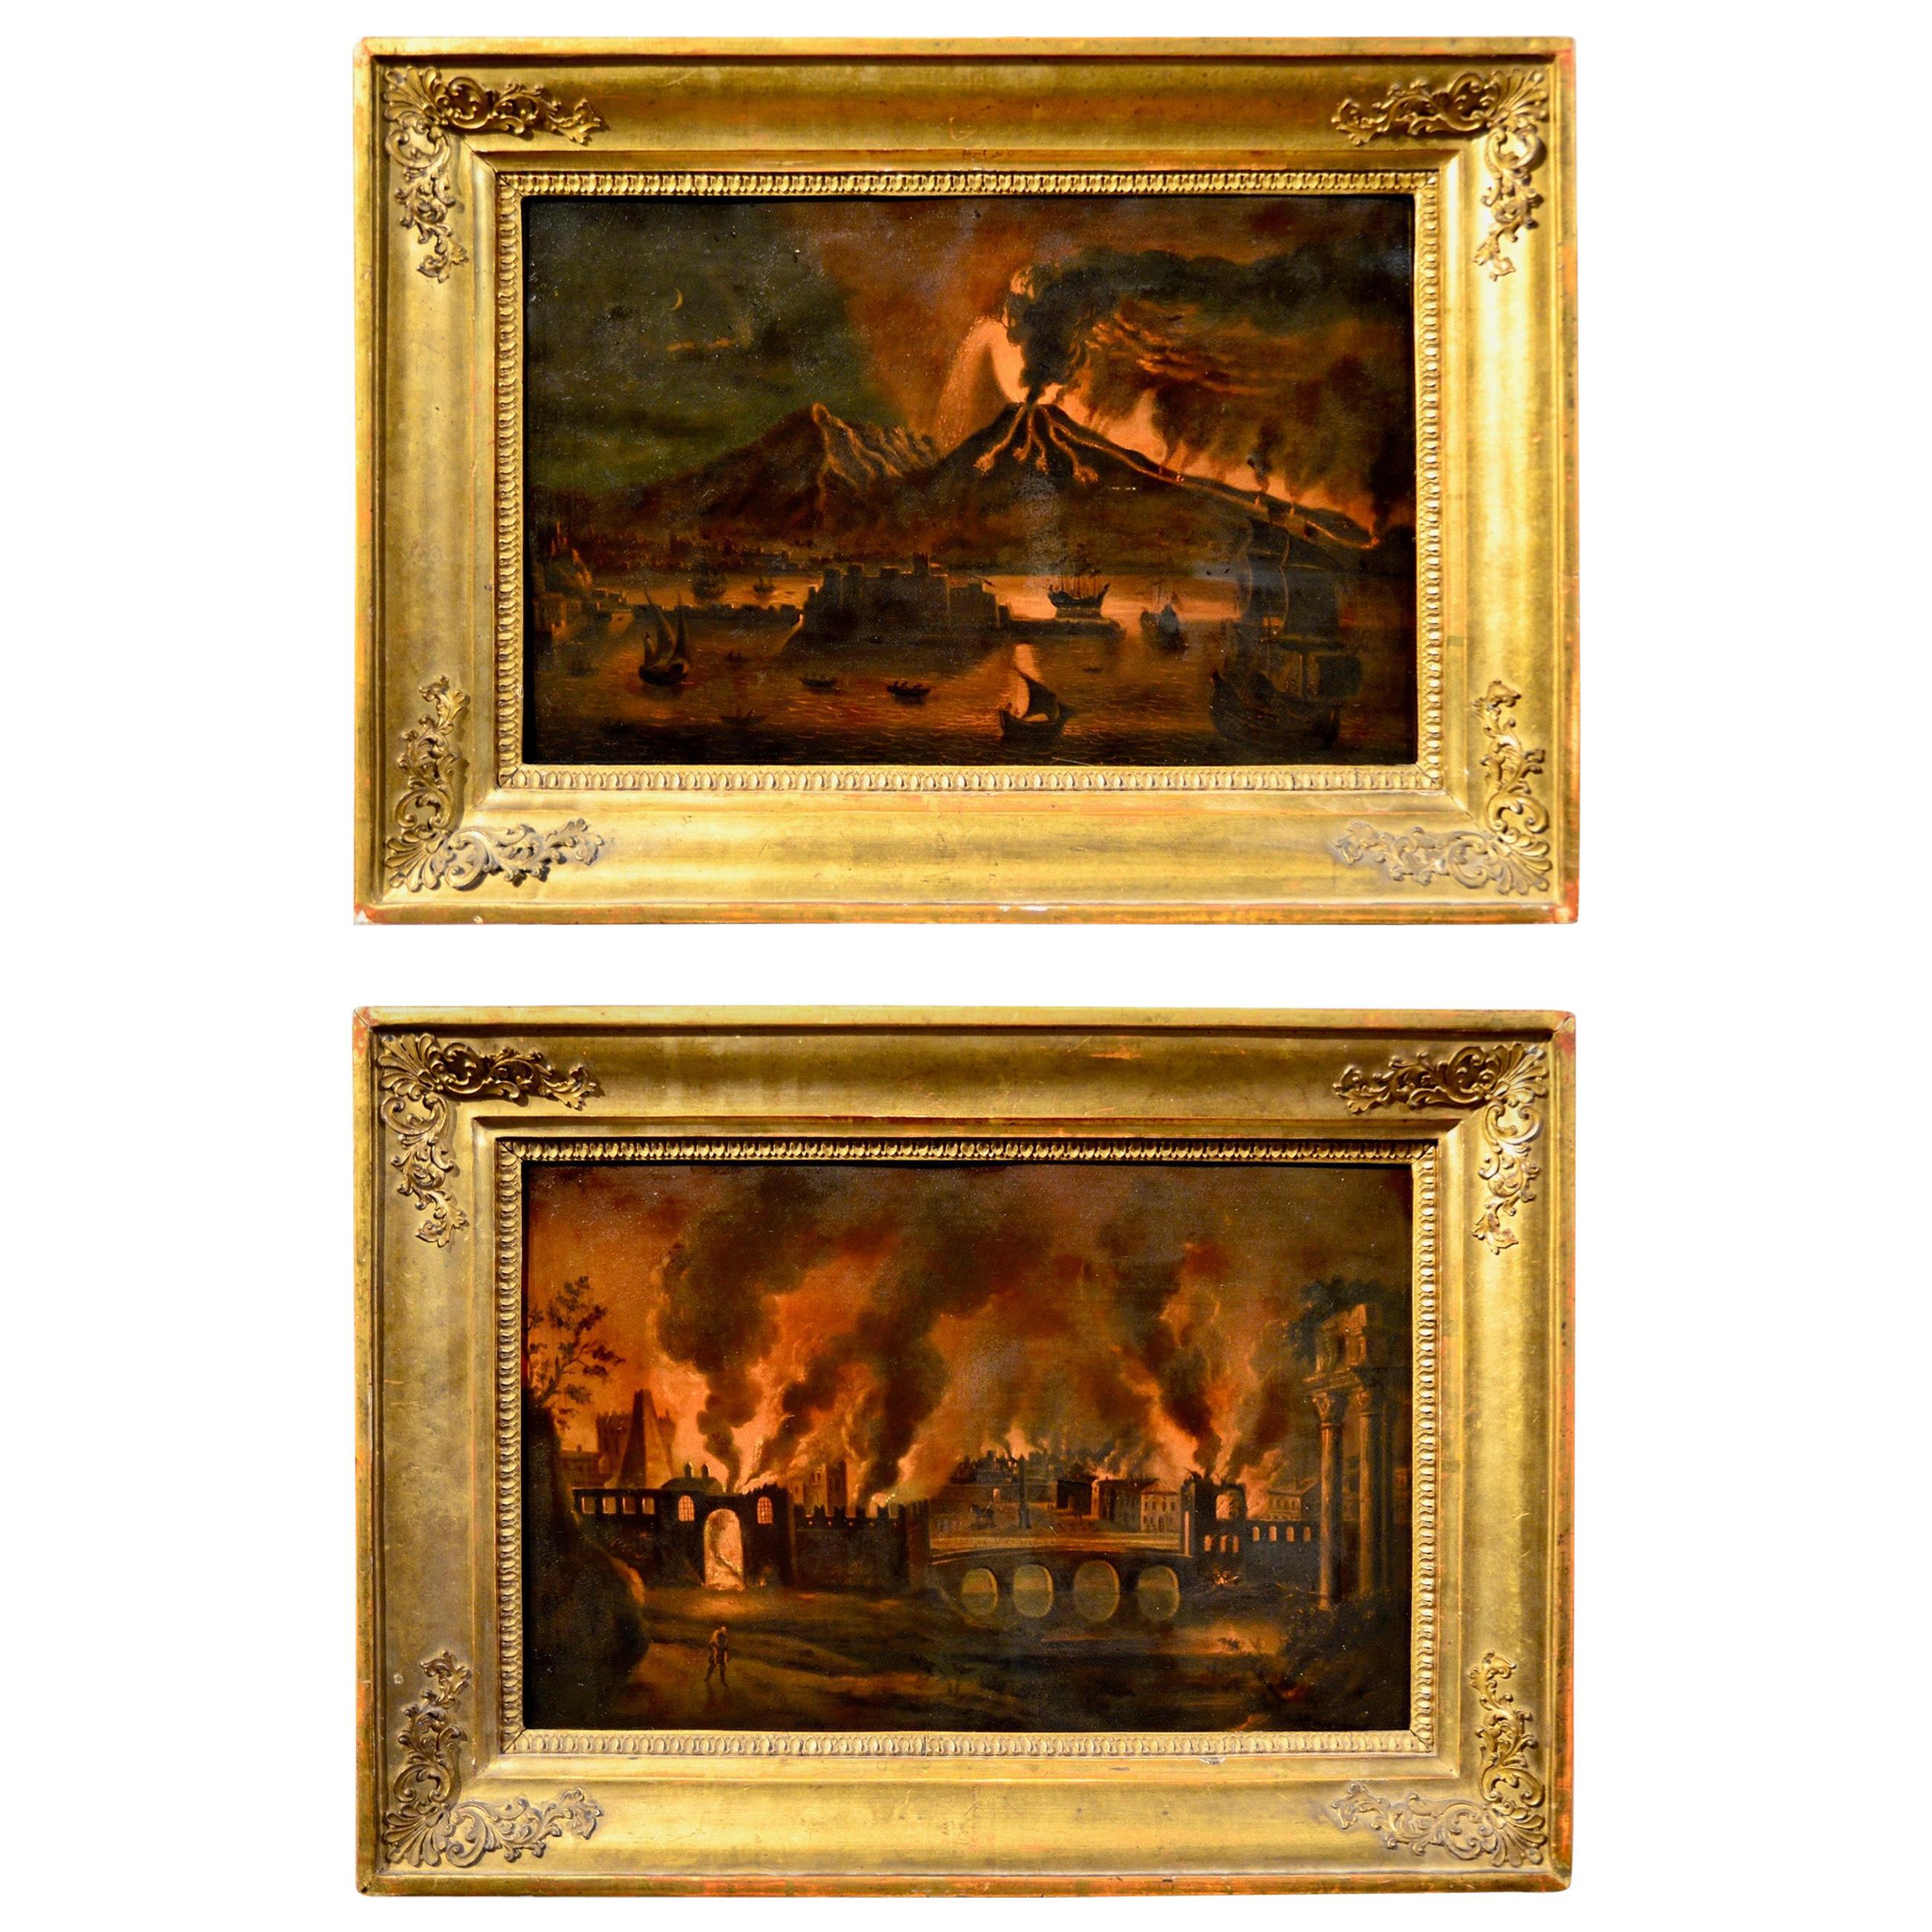 Pair of Paintings, Oil on Copper